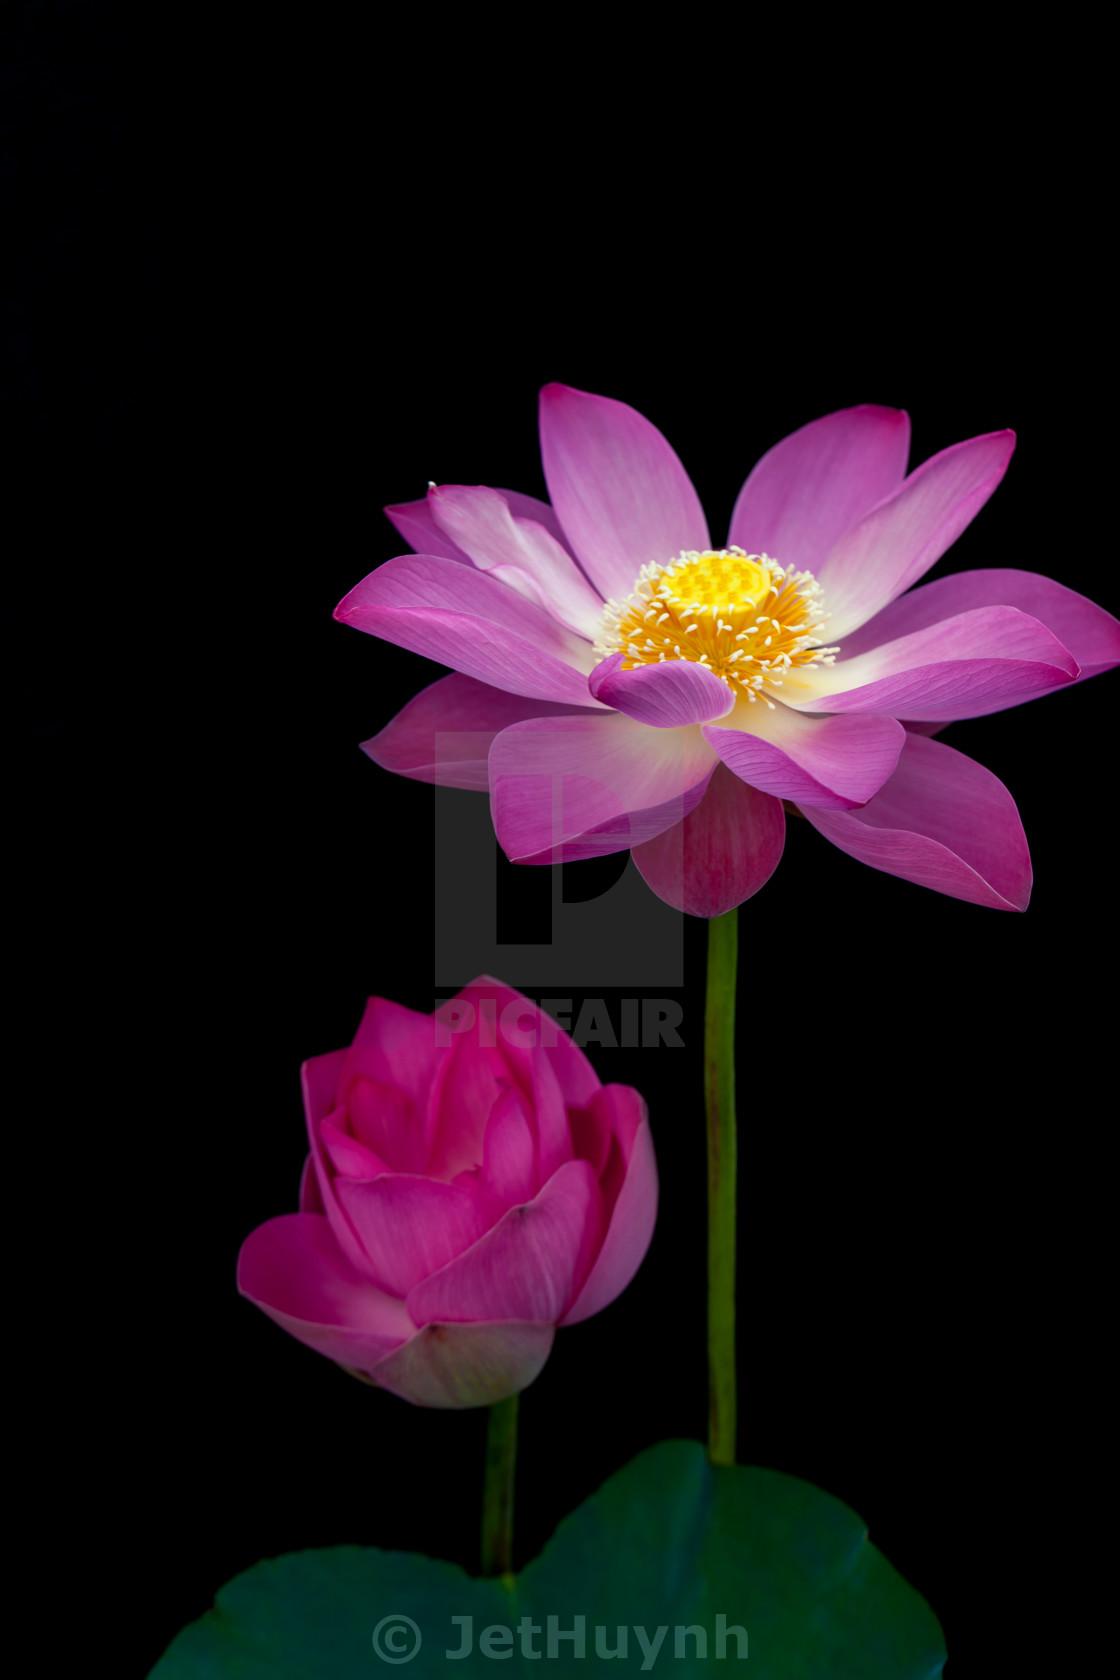 Beautiful lotus flower hoa sen blooming black background beautiful lotus flower hoa sen blooming black background stock image izmirmasajfo